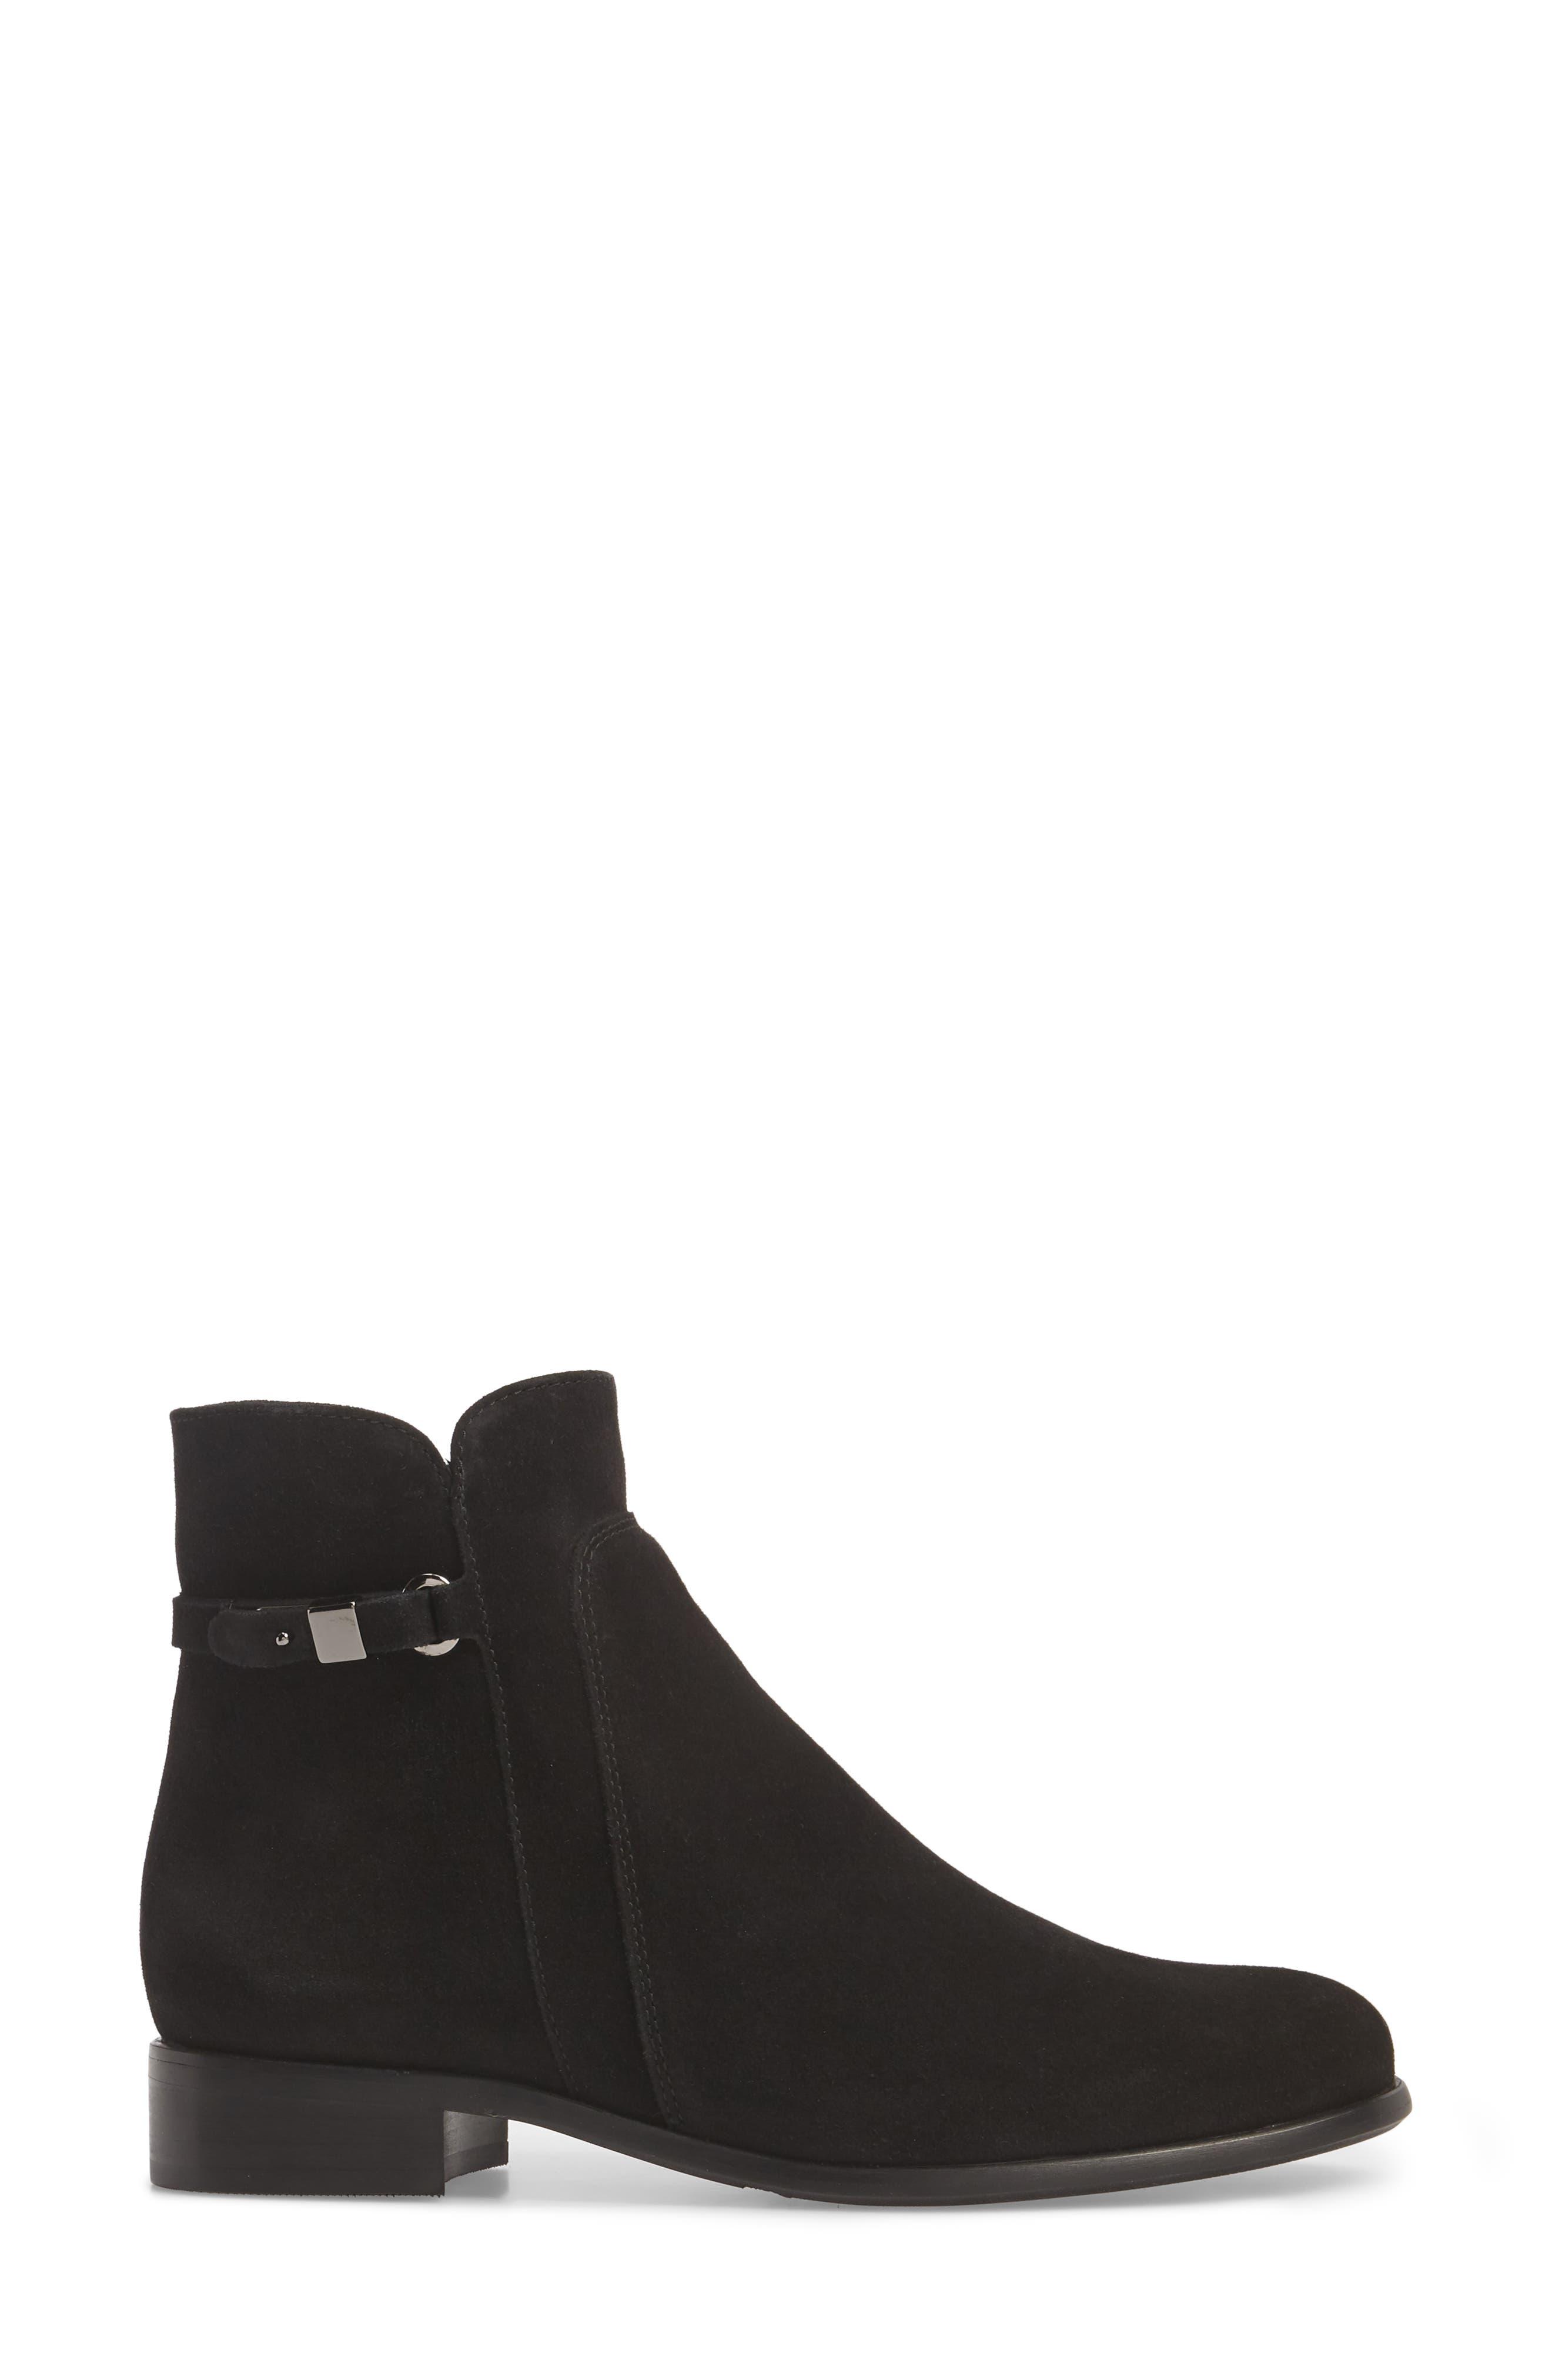 Sicilia Waterproof Boot,                             Alternate thumbnail 3, color,                             BLACK SUEDE